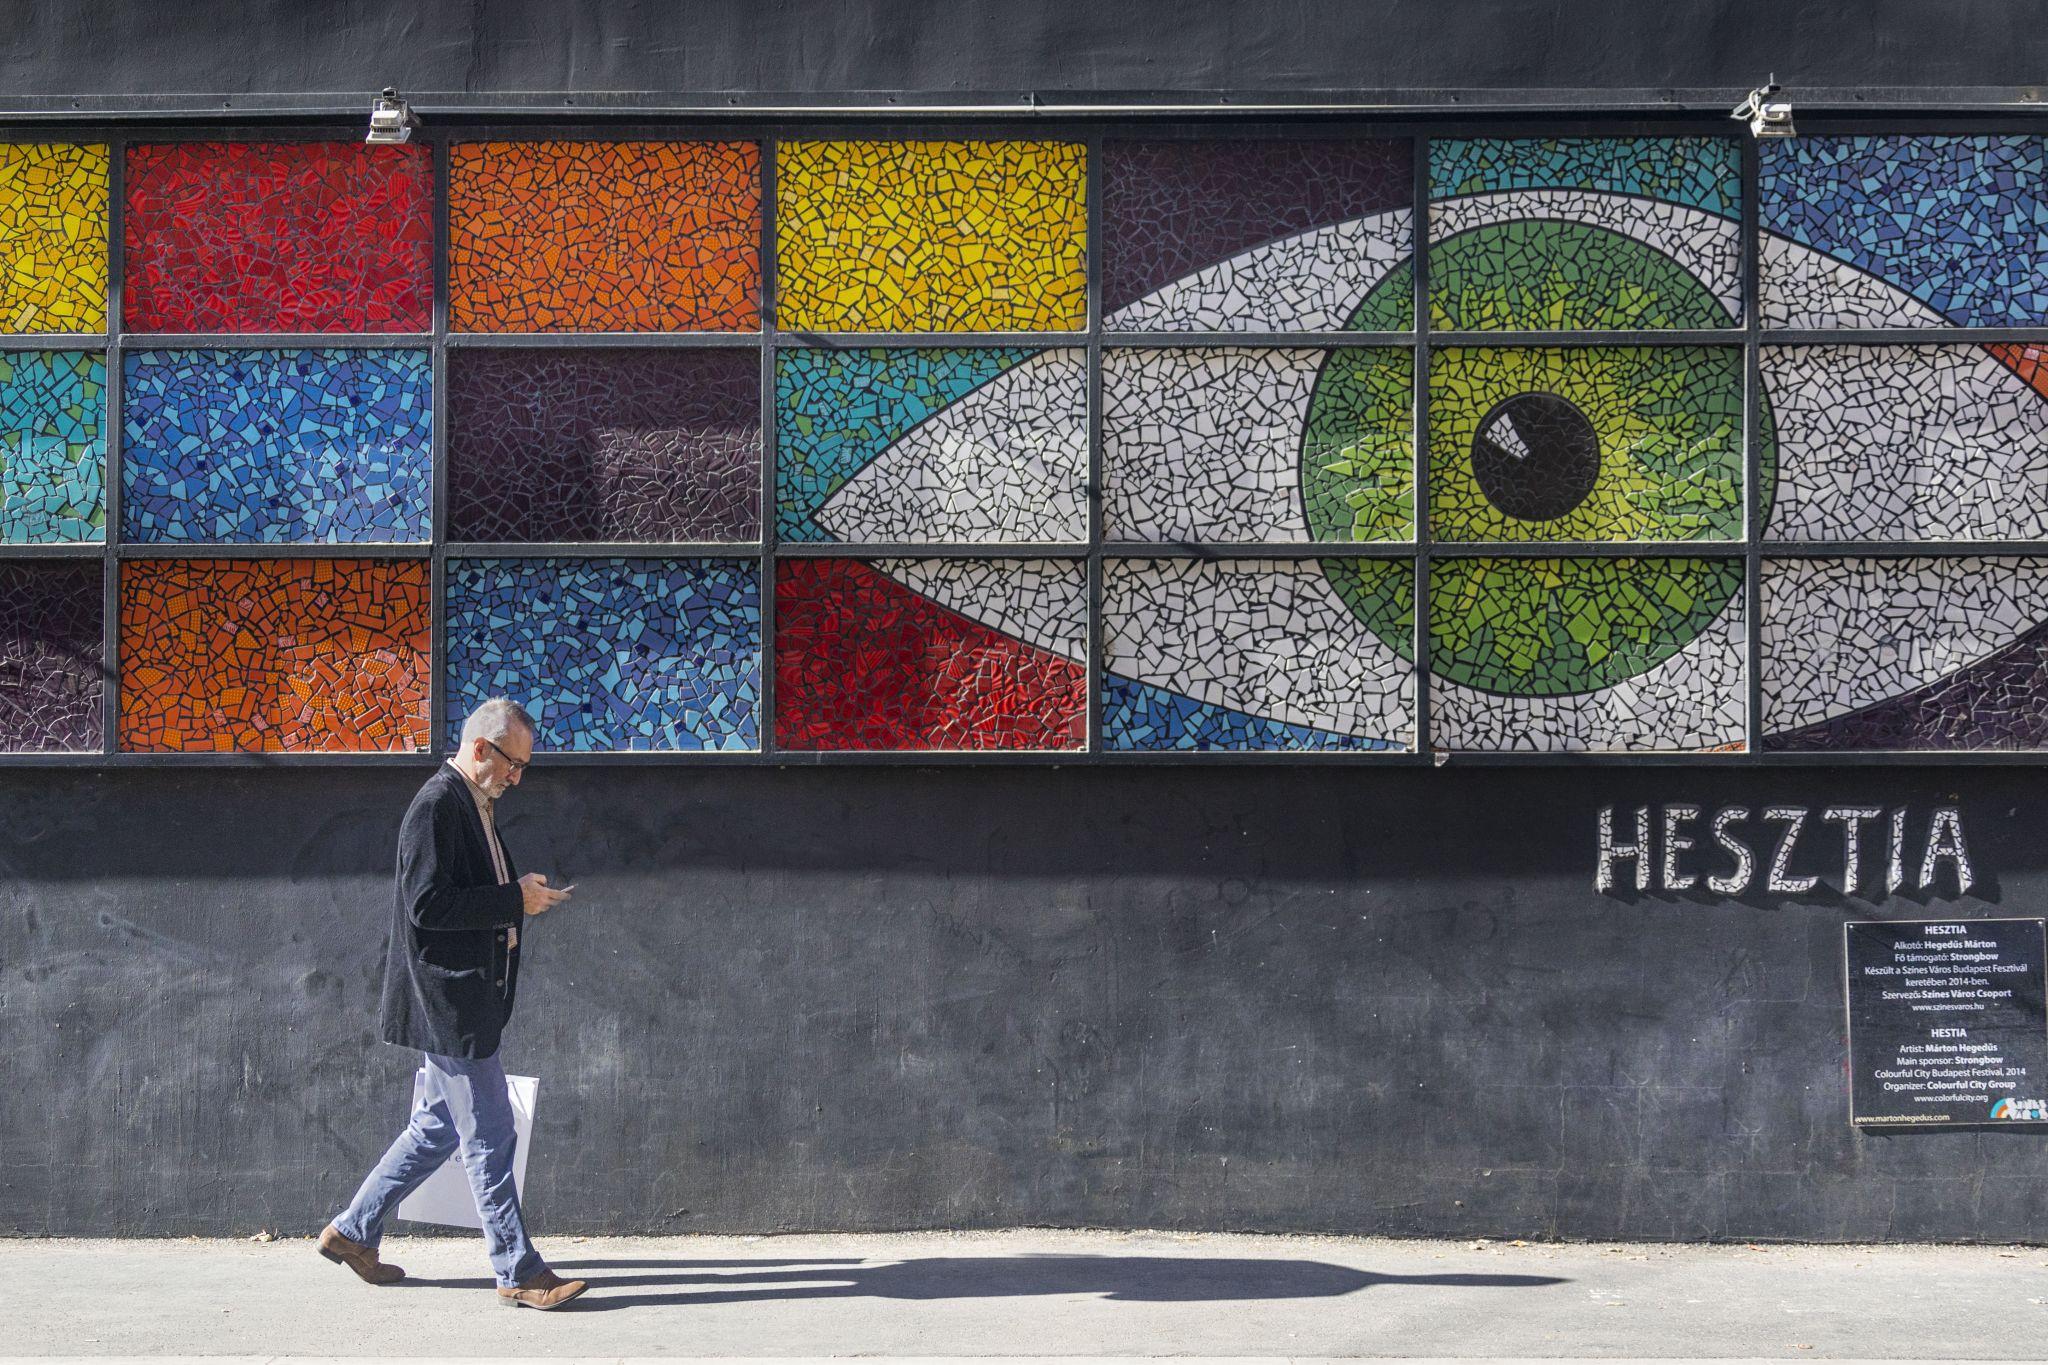 The Eye, Hungary